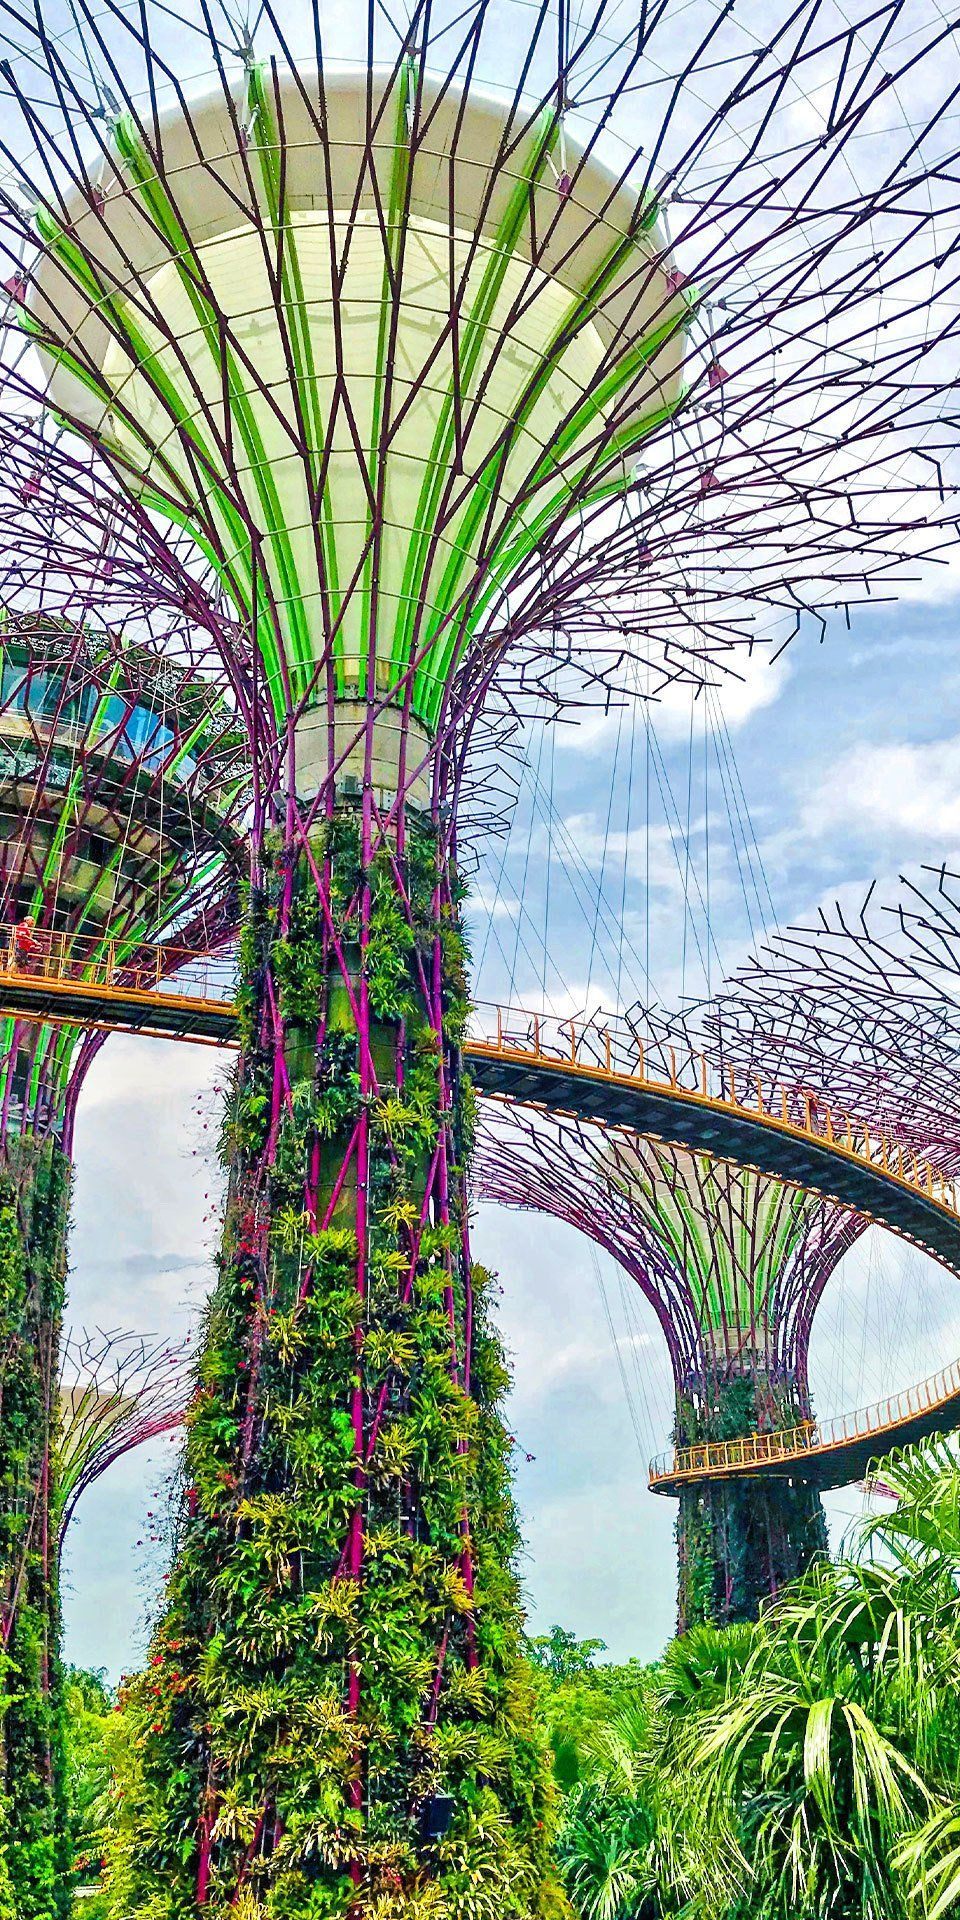 Singapore Singapore The Singapore Botanic Garden And Adjoining